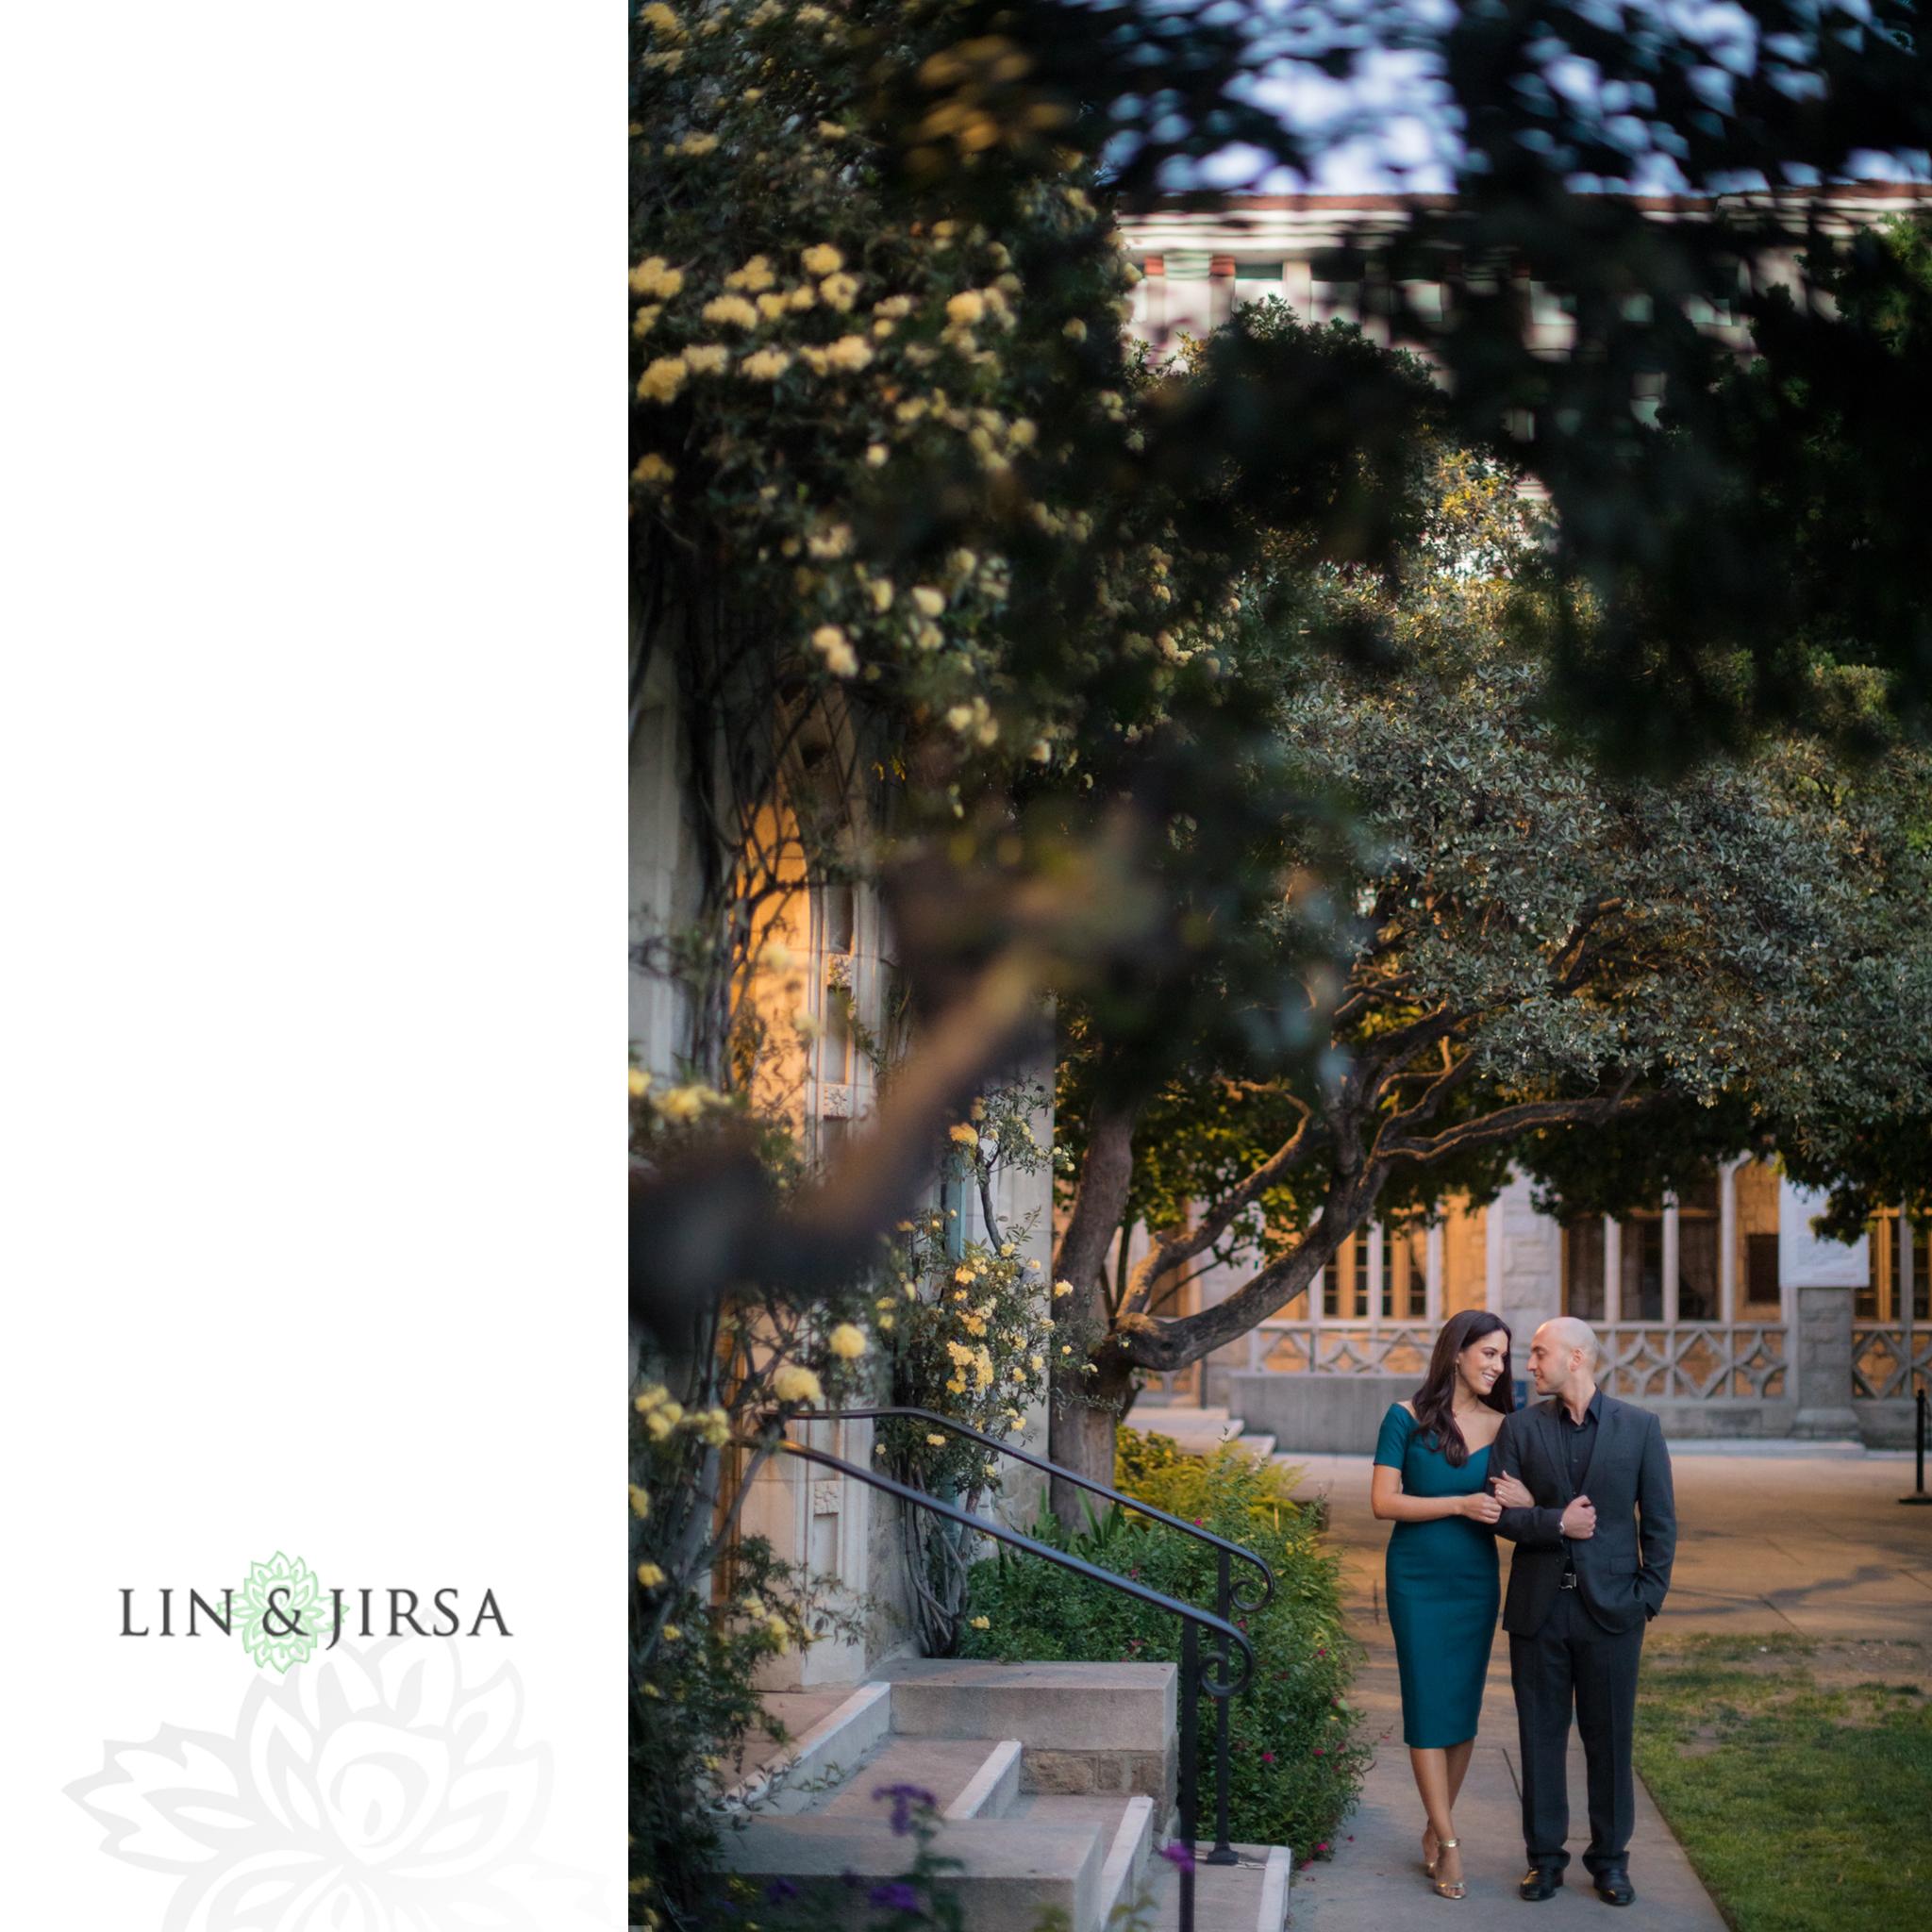 17-Los-angeles-arboretum-engagement-photography